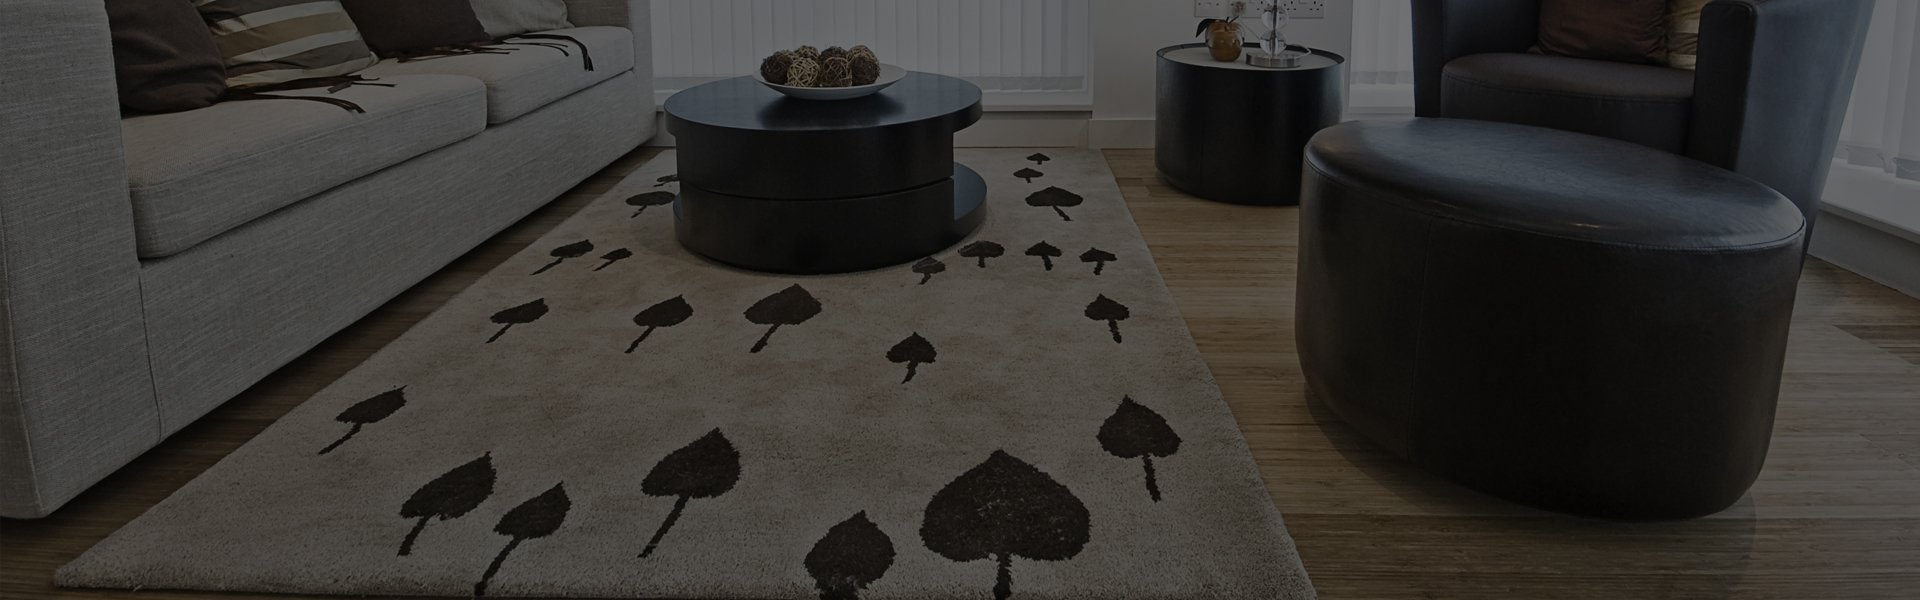 A cream carpet in a living room